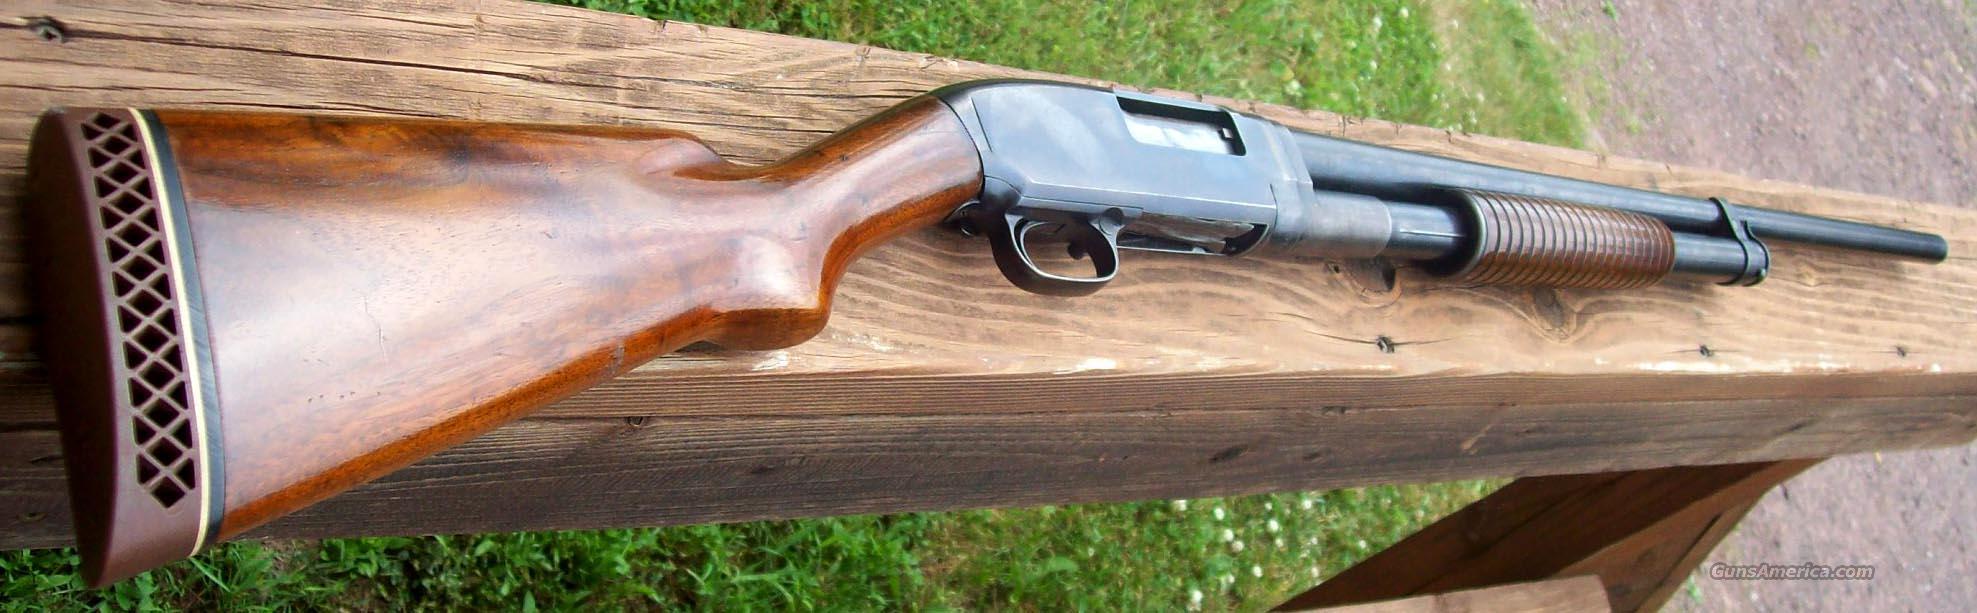 Model value winchester 12 Winchester model